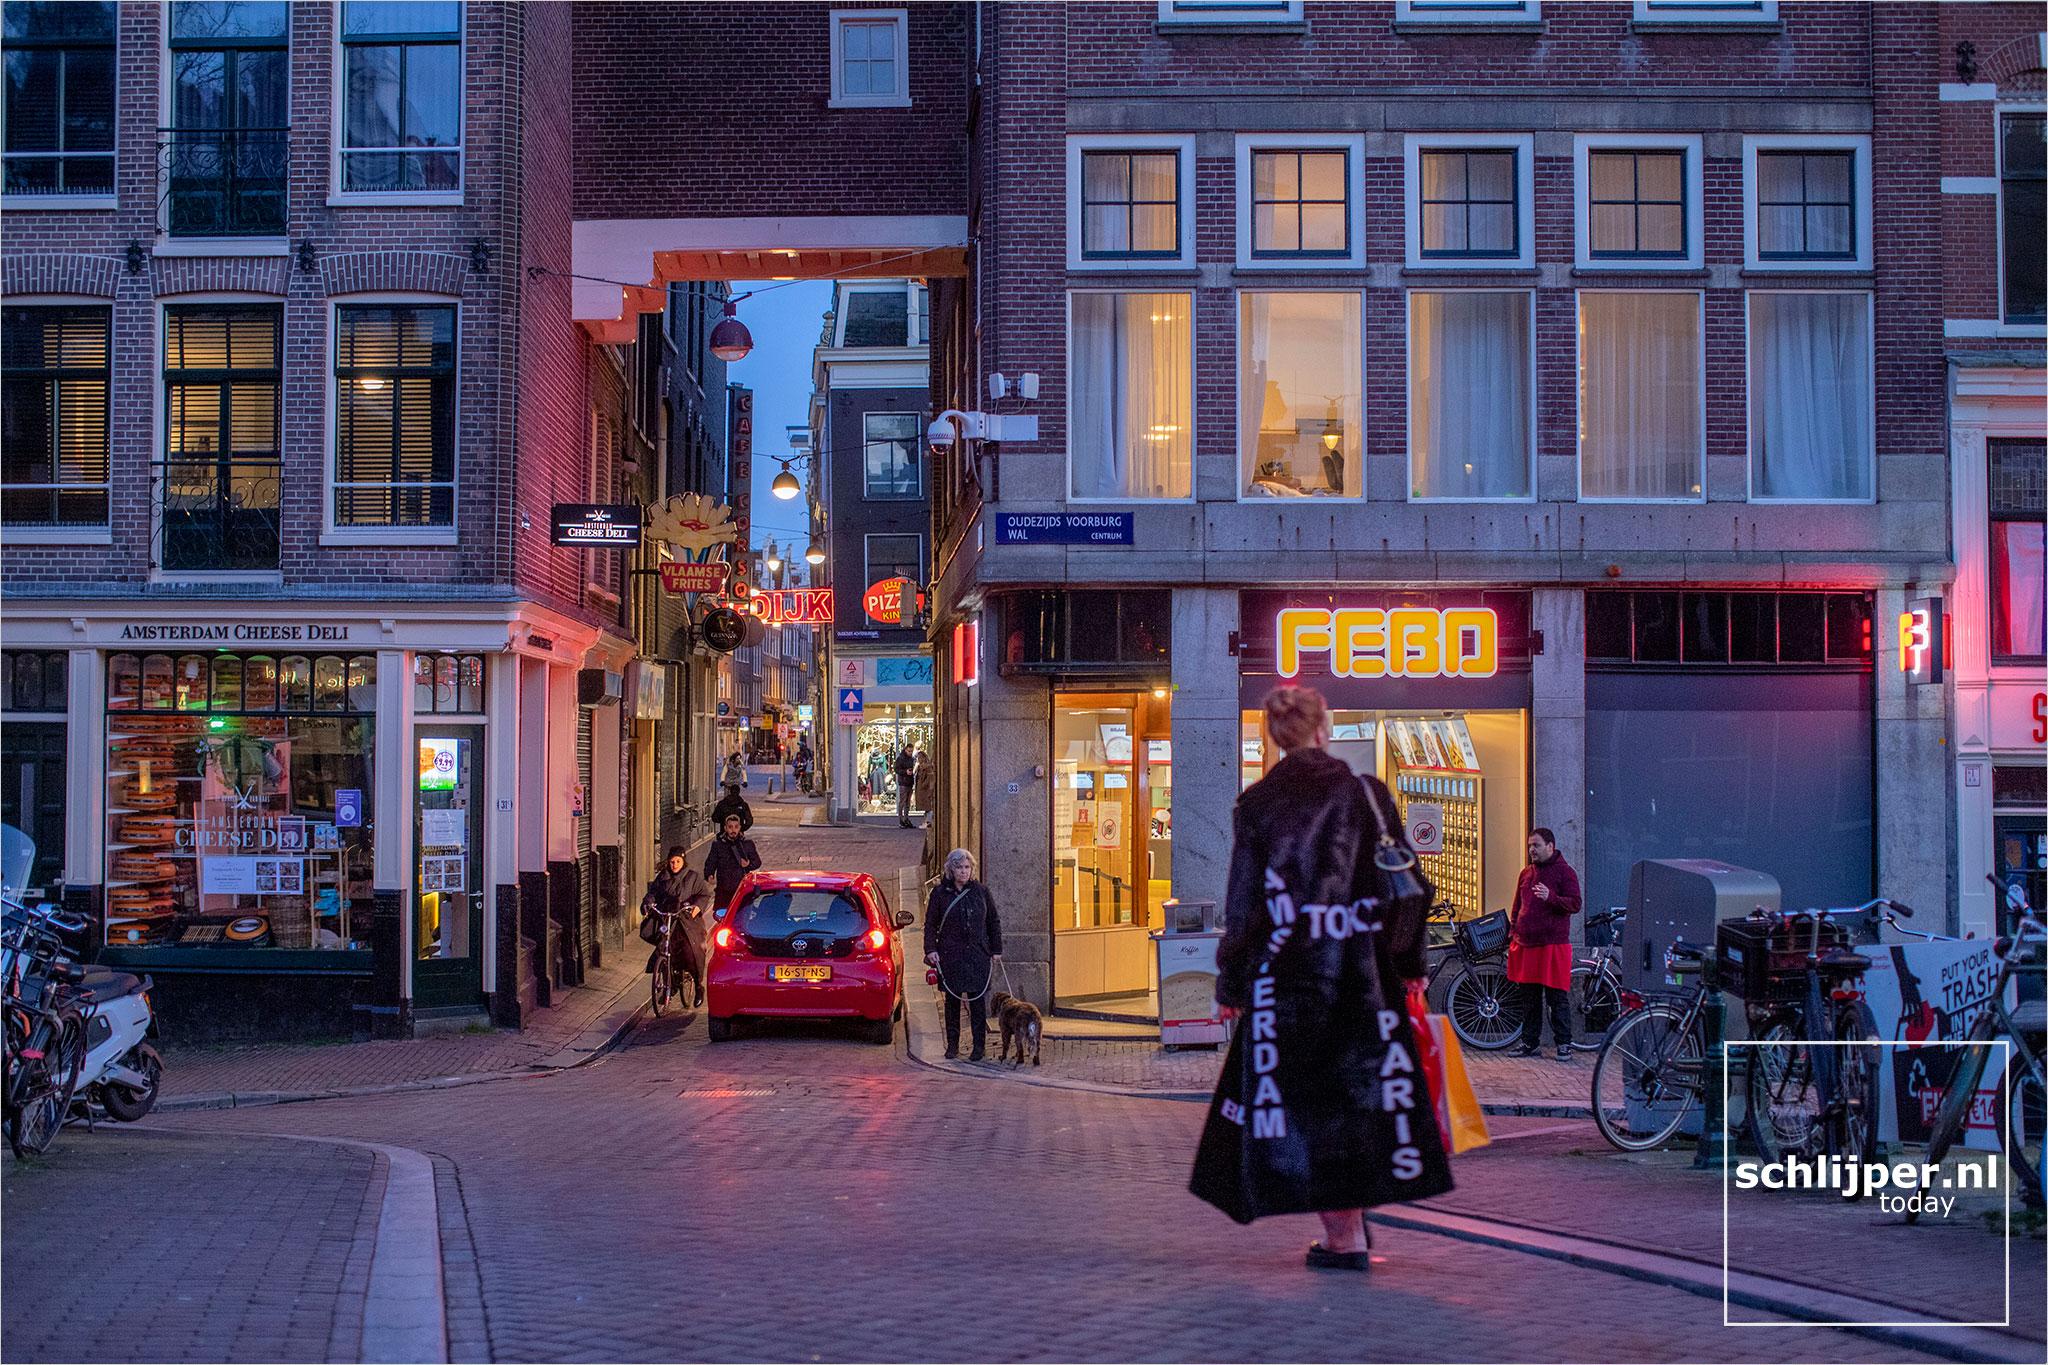 The Netherlands, Amsterdam, 8 januari 2021